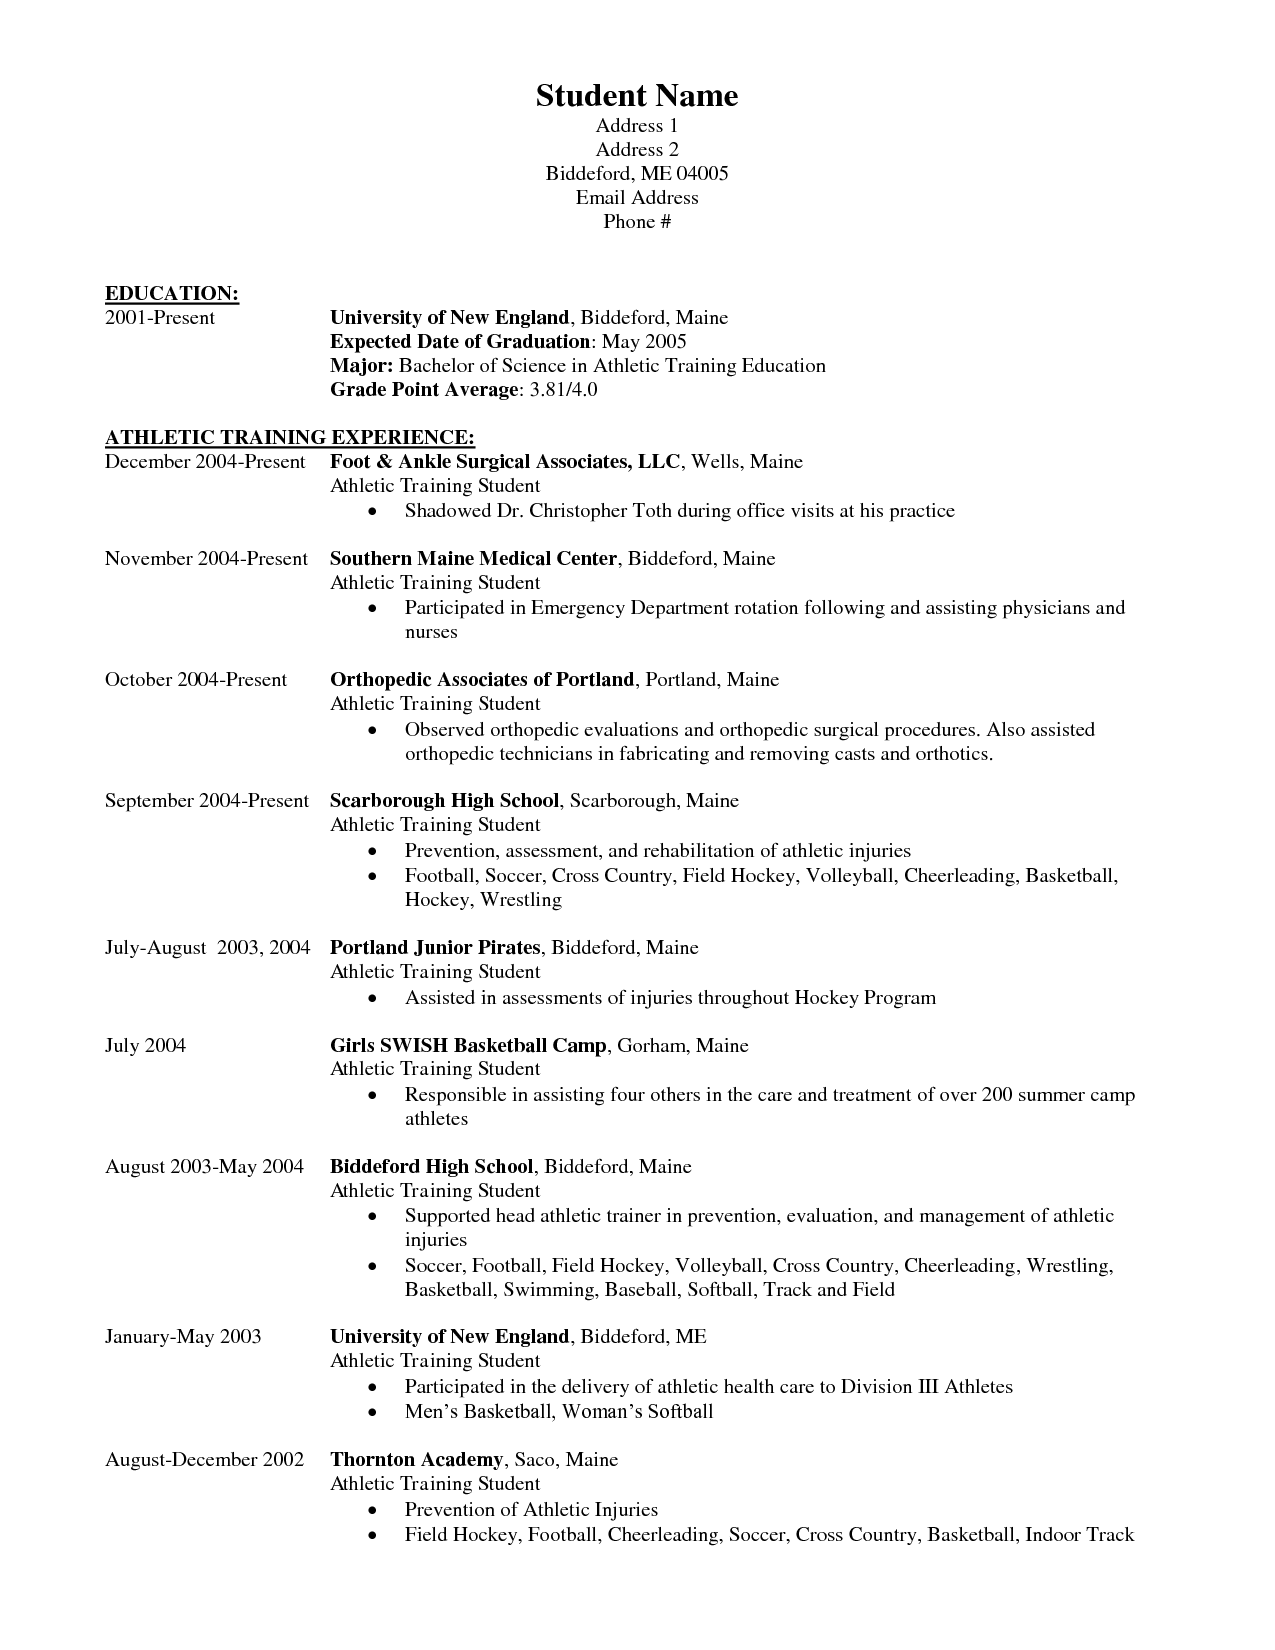 Fast Food Manager Resume Letters Resumes Cover Letter Resume Samples Nursing Student Sample